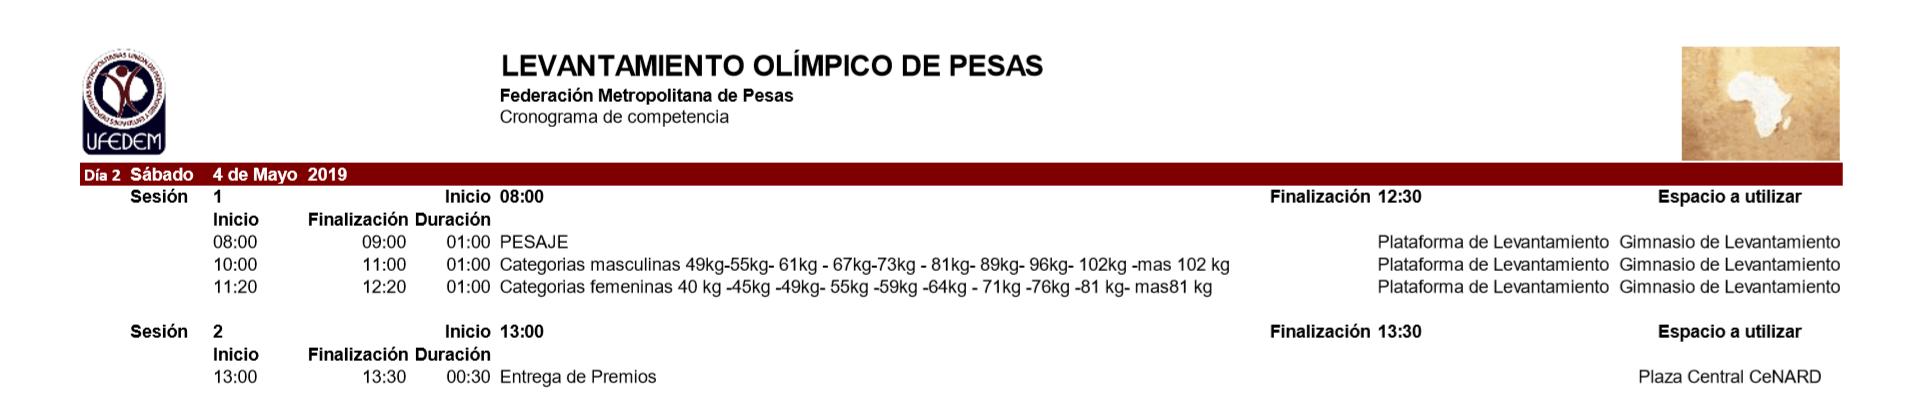 Levantamiento Olimpico de pesas 2.1 - Cronograma